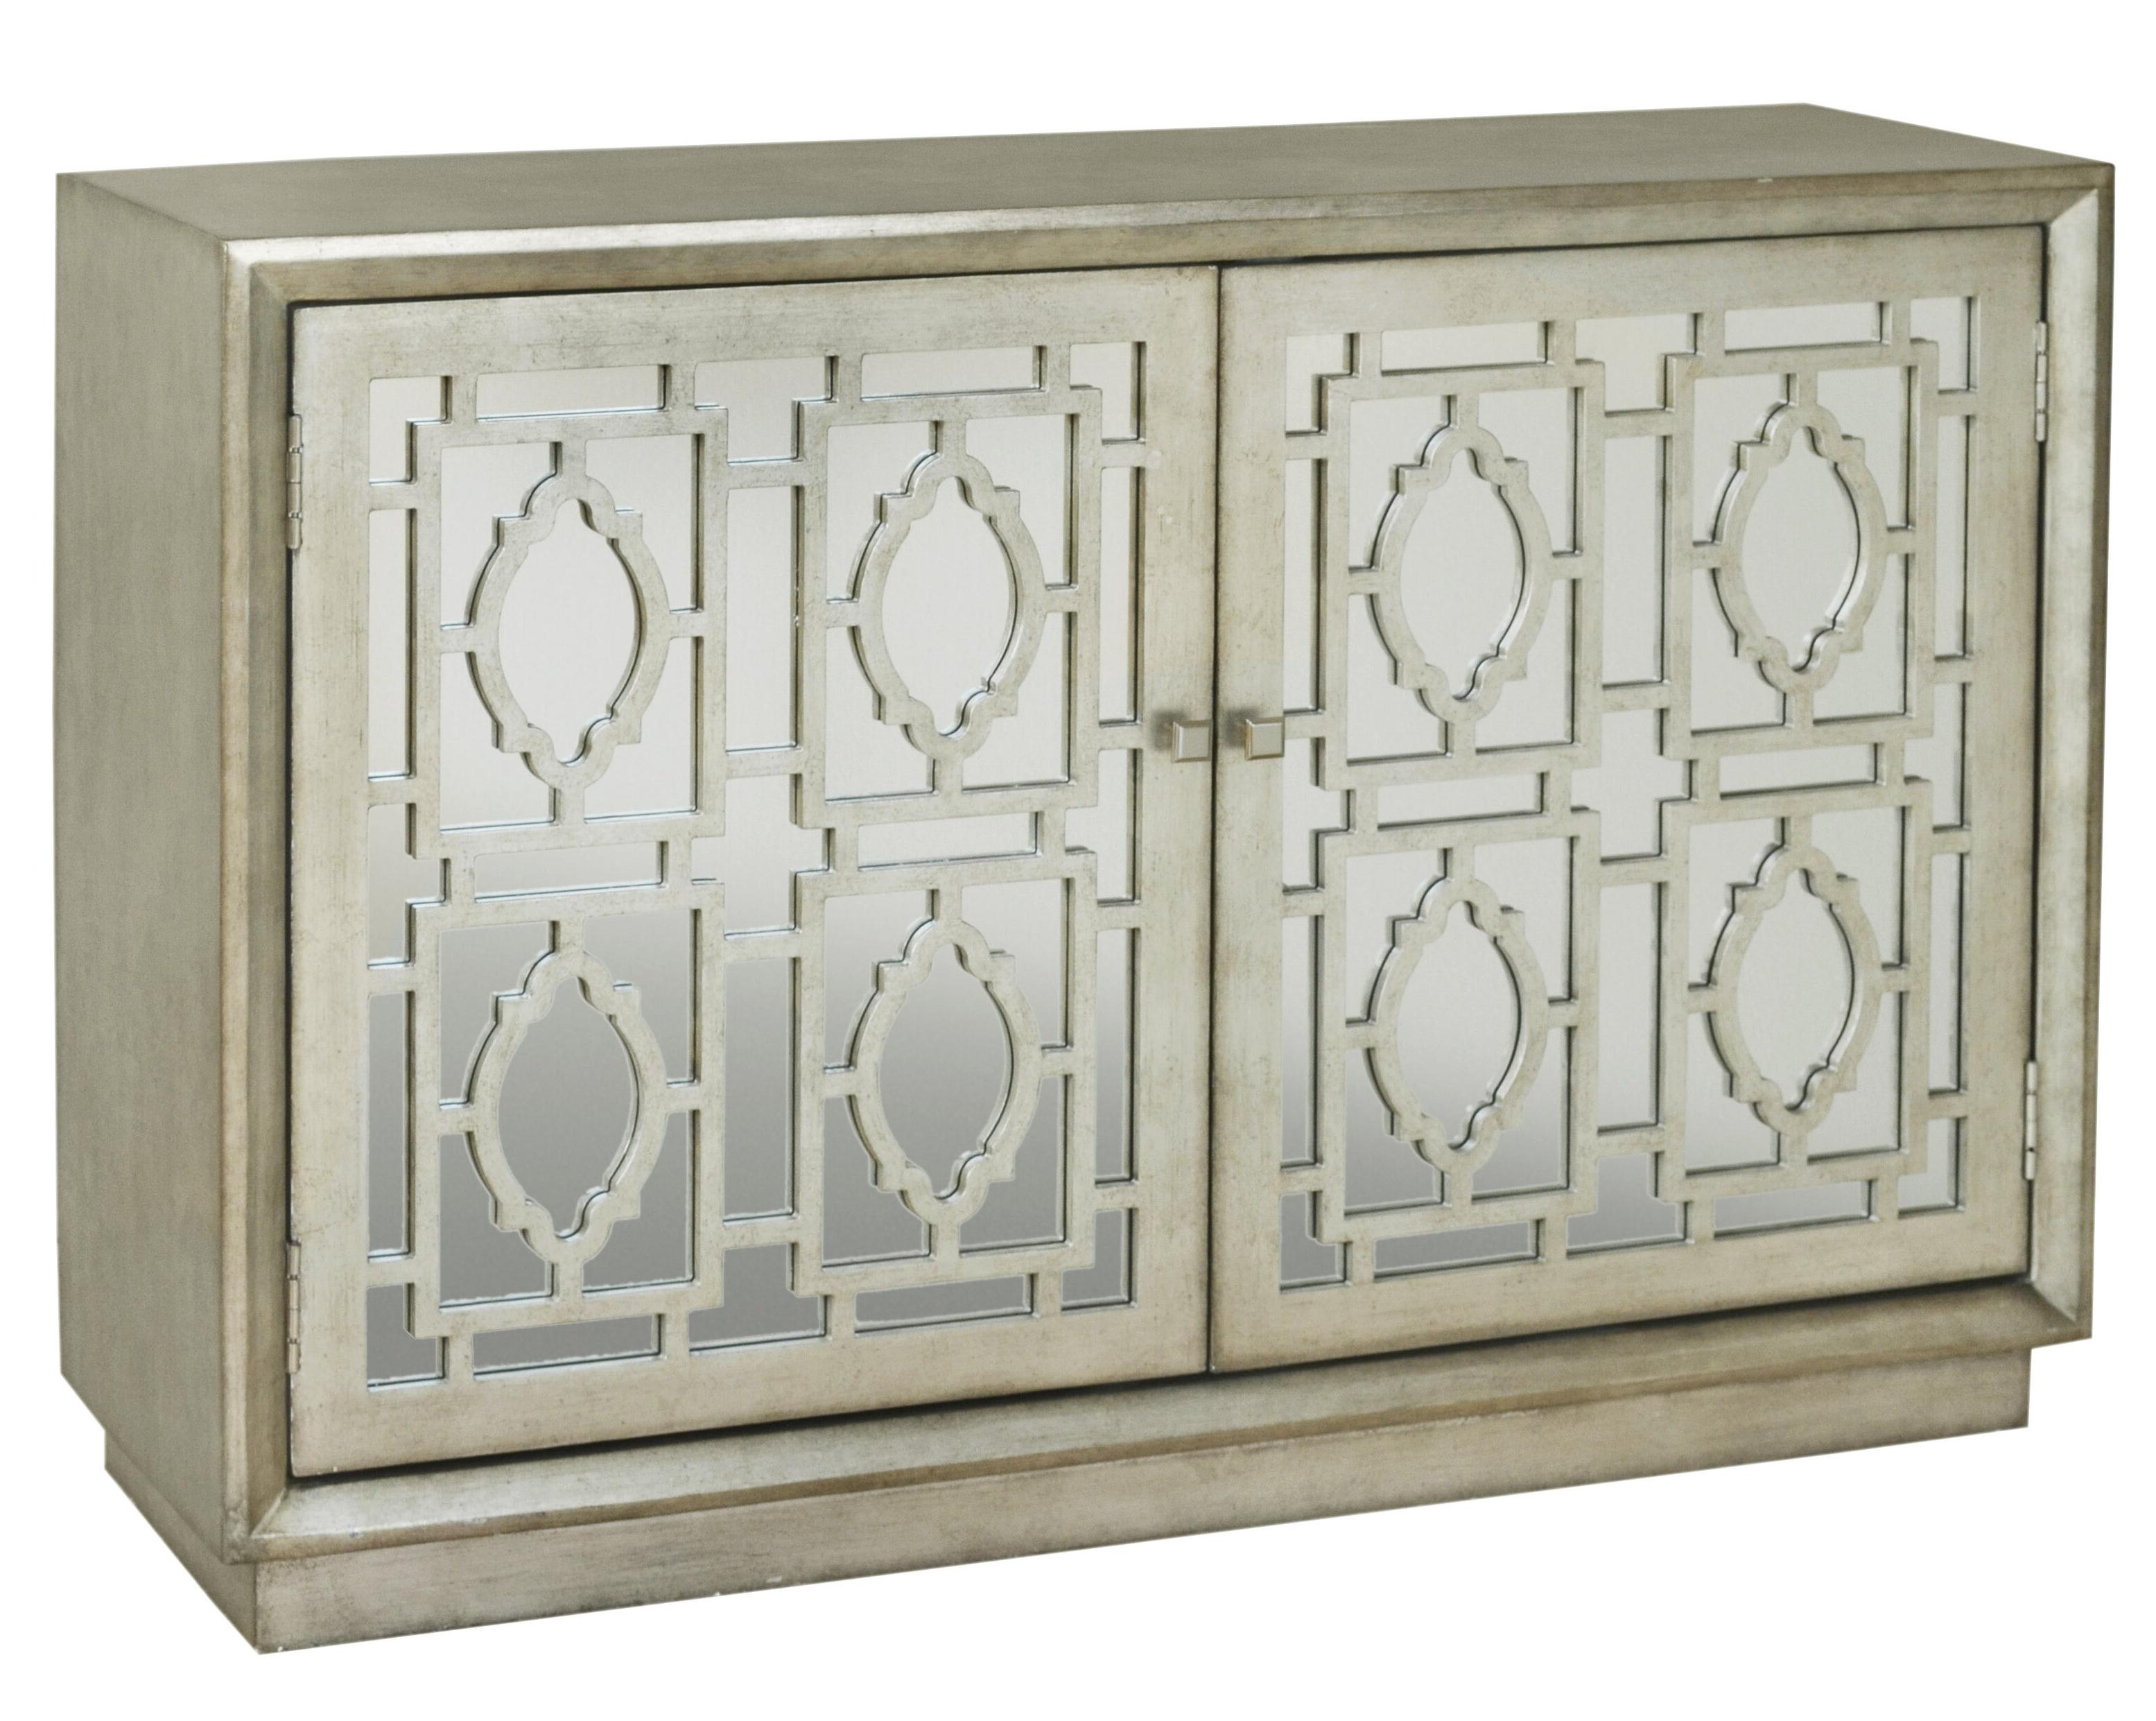 Talley 2 Door Credenza Accent Cabinet With Exagonal Geometry Credenzas (View 17 of 20)